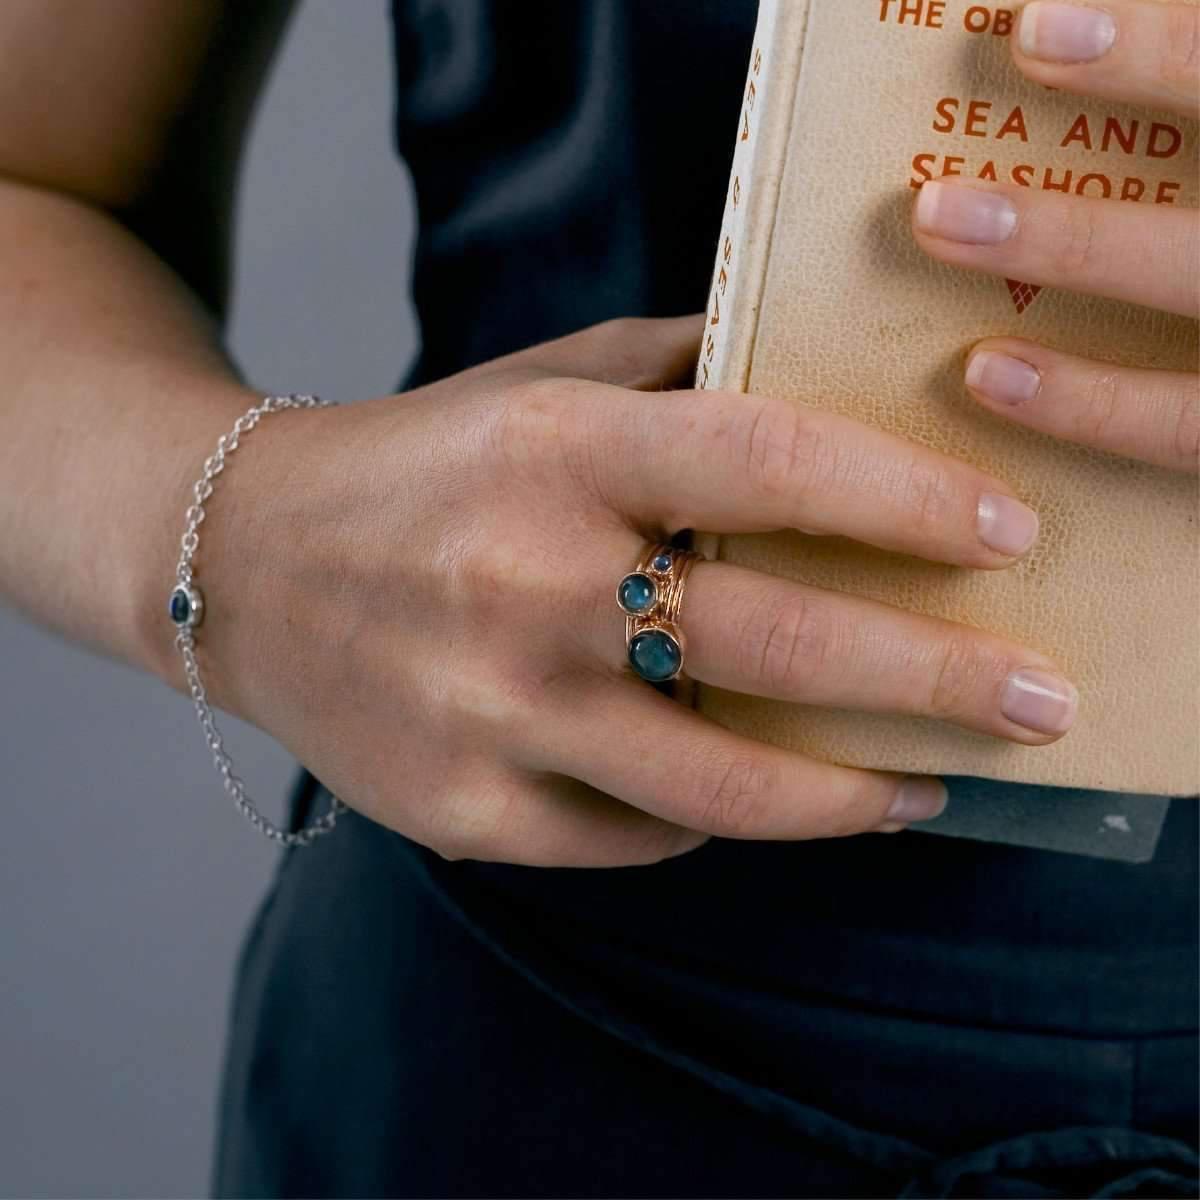 Alison Moore Designs Star And Labradorite Stacking Rings - UK U - US 10 1/4 - EU 62 3/4 Uqz4jajB